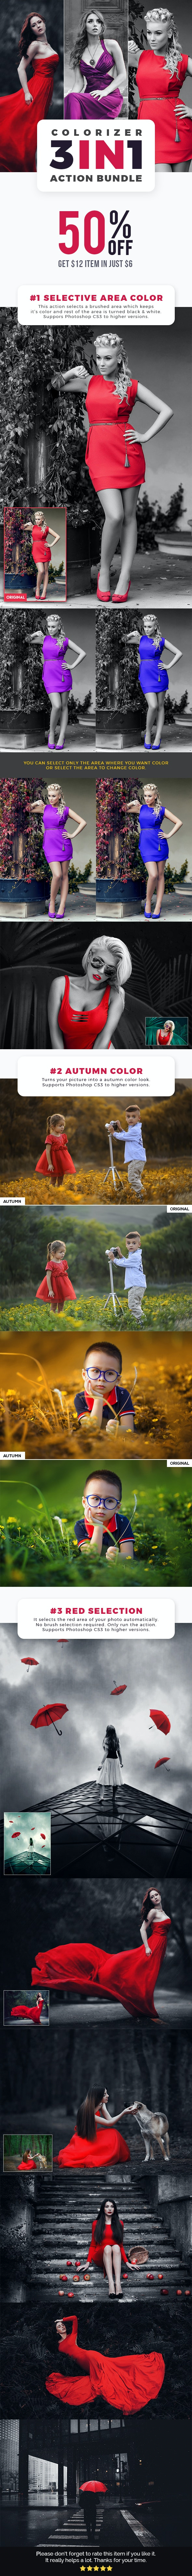 Colorizer Action Bundle - Photo Effects Actions